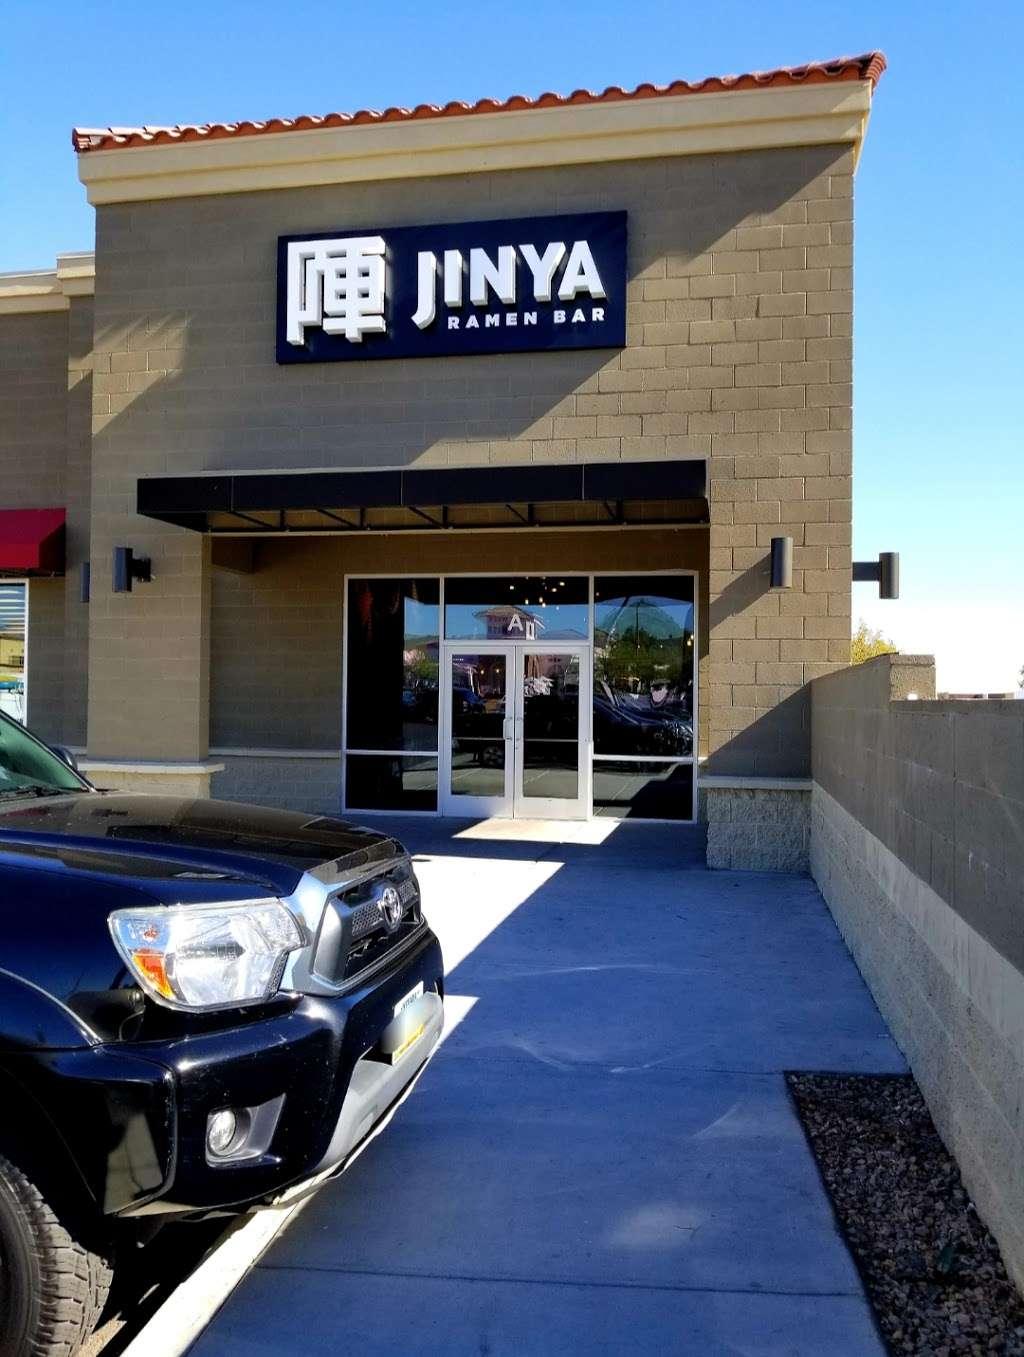 JINYA Ramen Bar - restaurant  | Photo 3 of 10 | Address: 7240 S Rainbow Blvd, Las Vegas, NV 89118, USA | Phone: (702) 476-0583